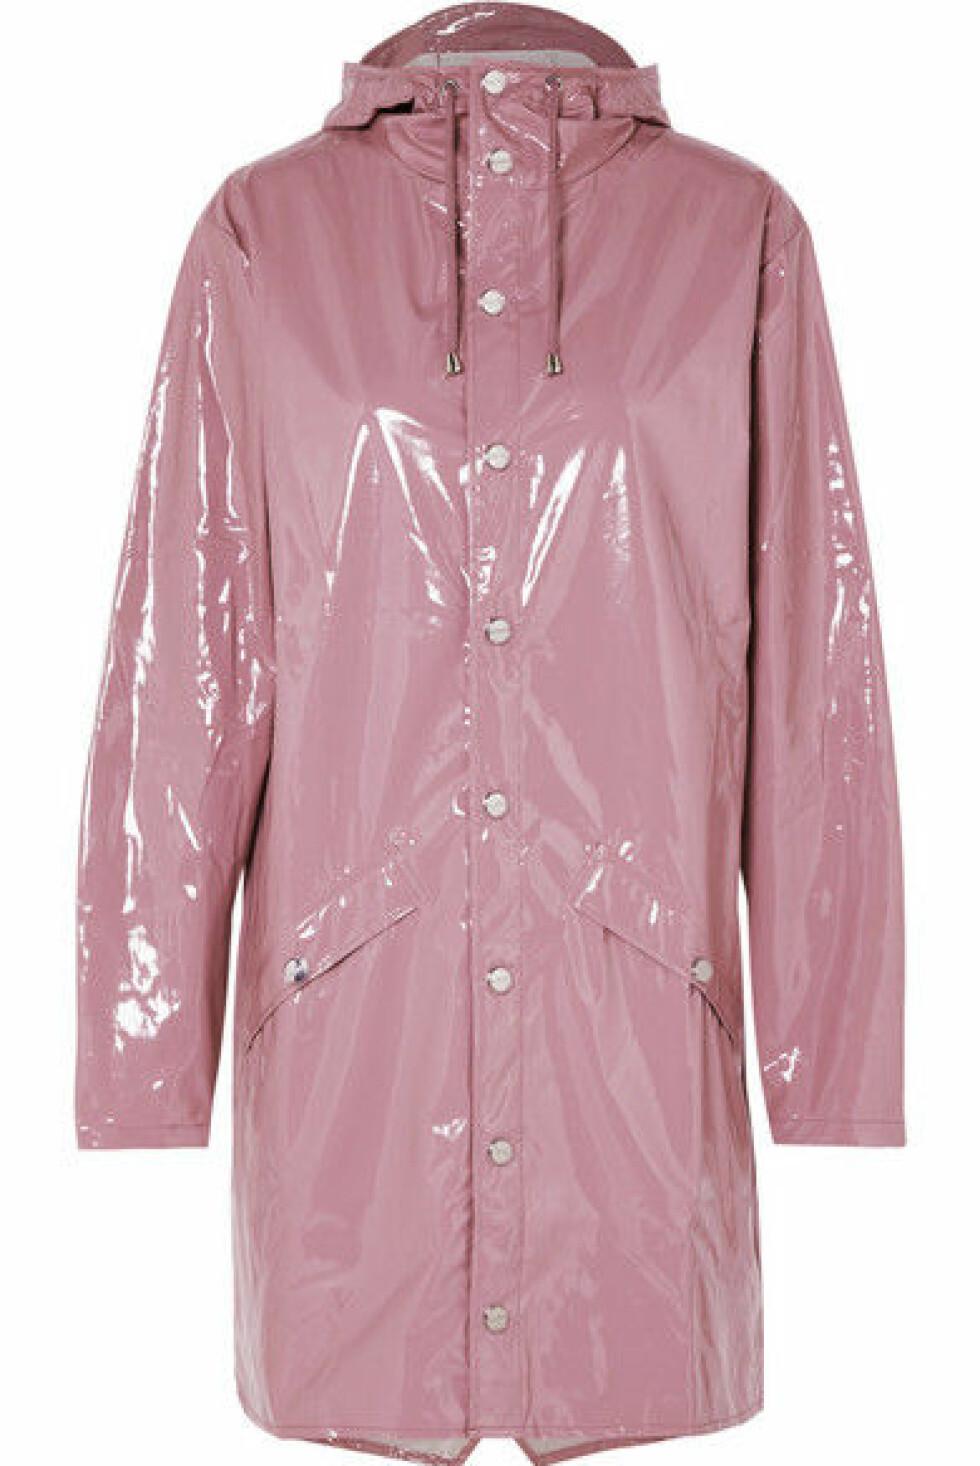 Regnjakke fra Rains |1500,-| https://www.net-a-porter.com/no/en/product/1089856/rains/hooded-glossed-pu-raincoat